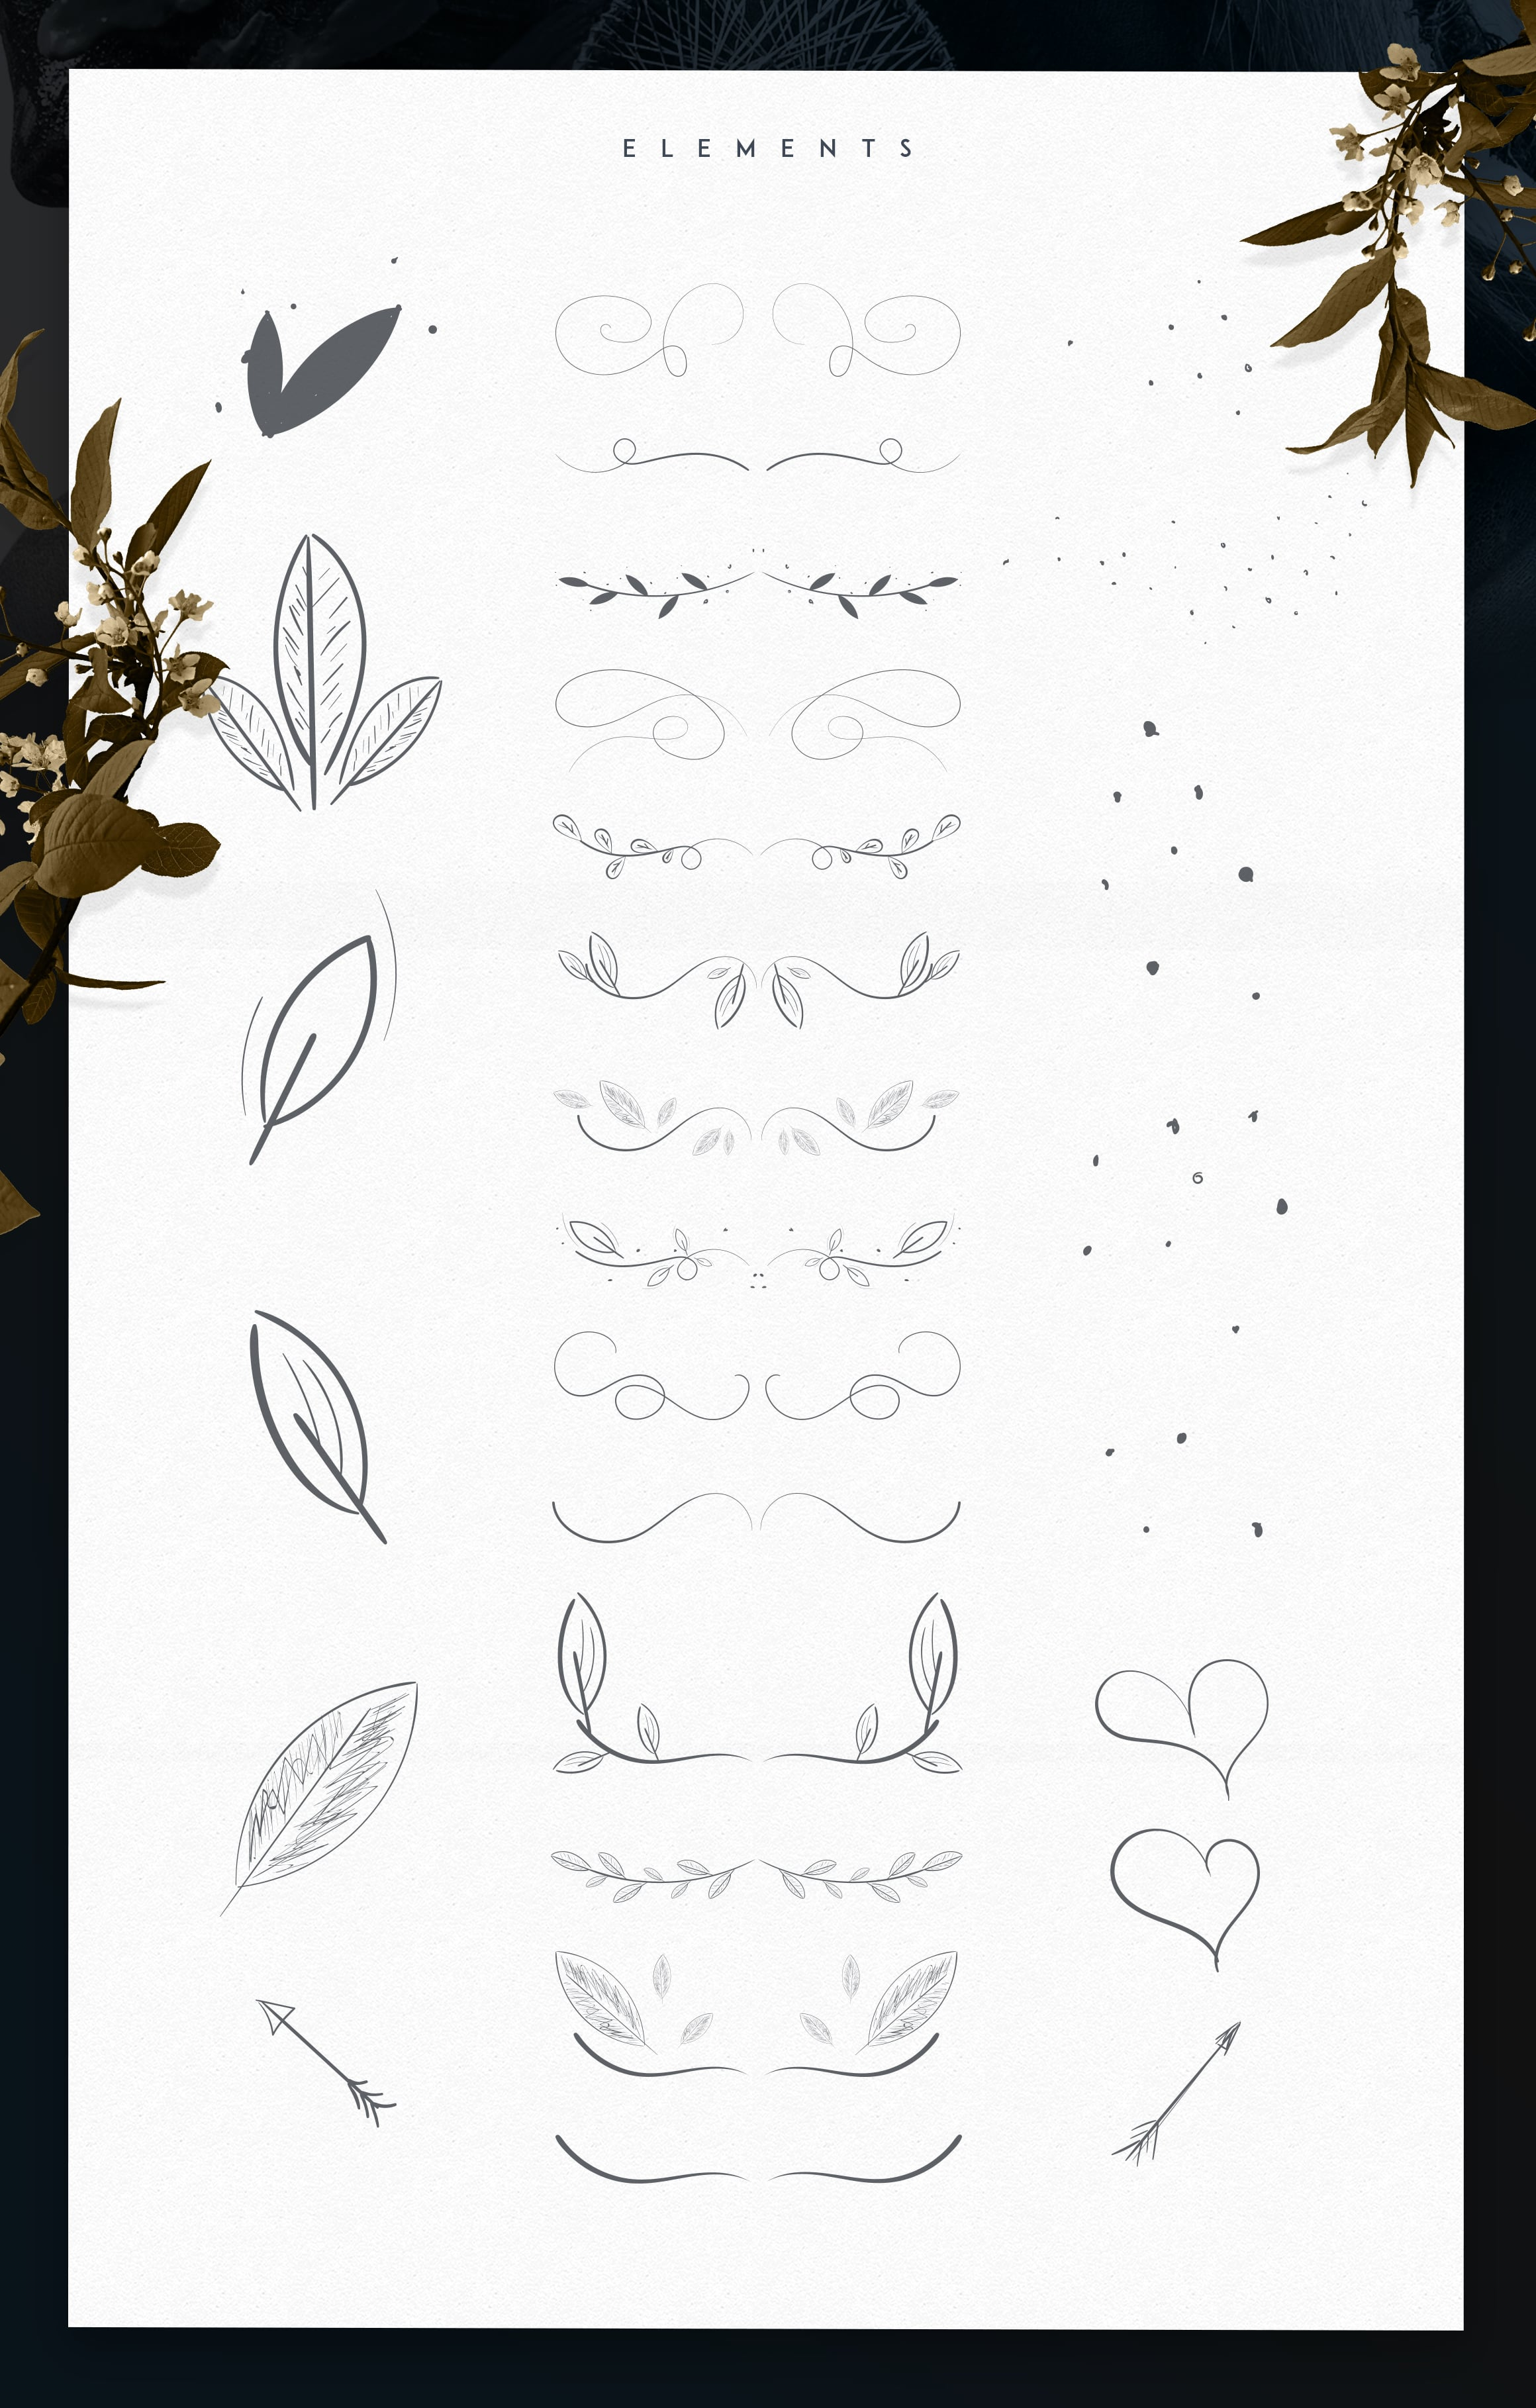 Emanuela Typeface and Designs